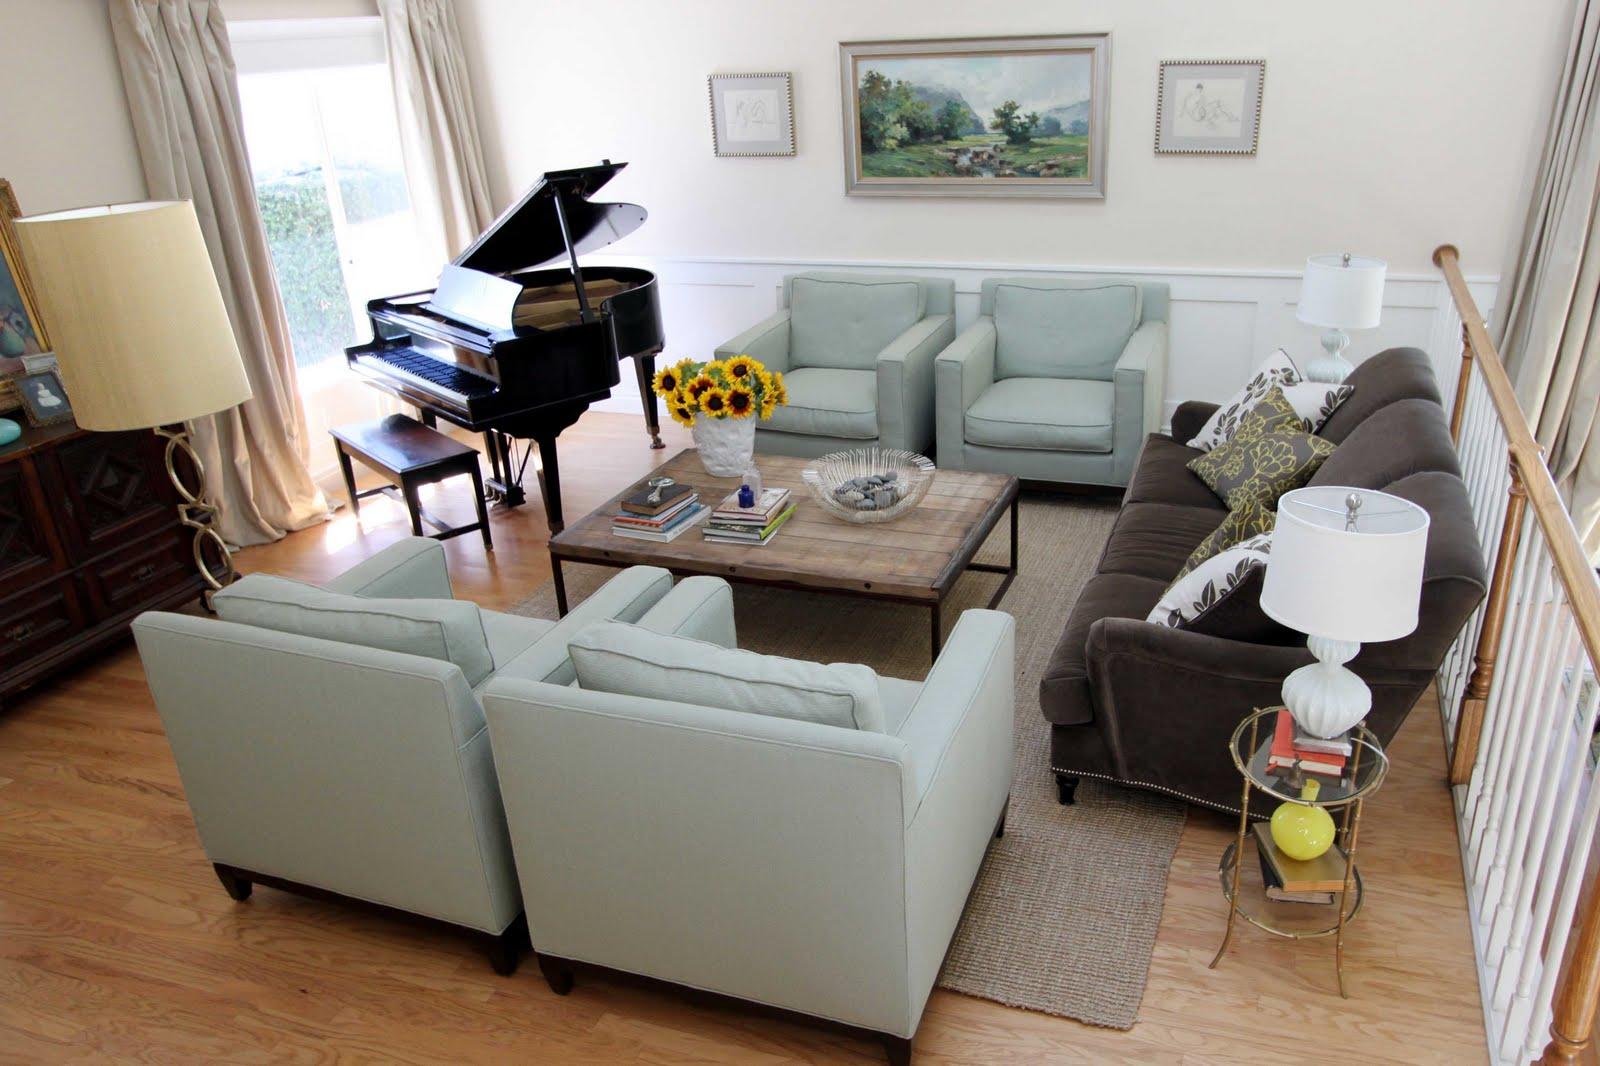 Restoration hardware inspired living room - Sf Interior Design